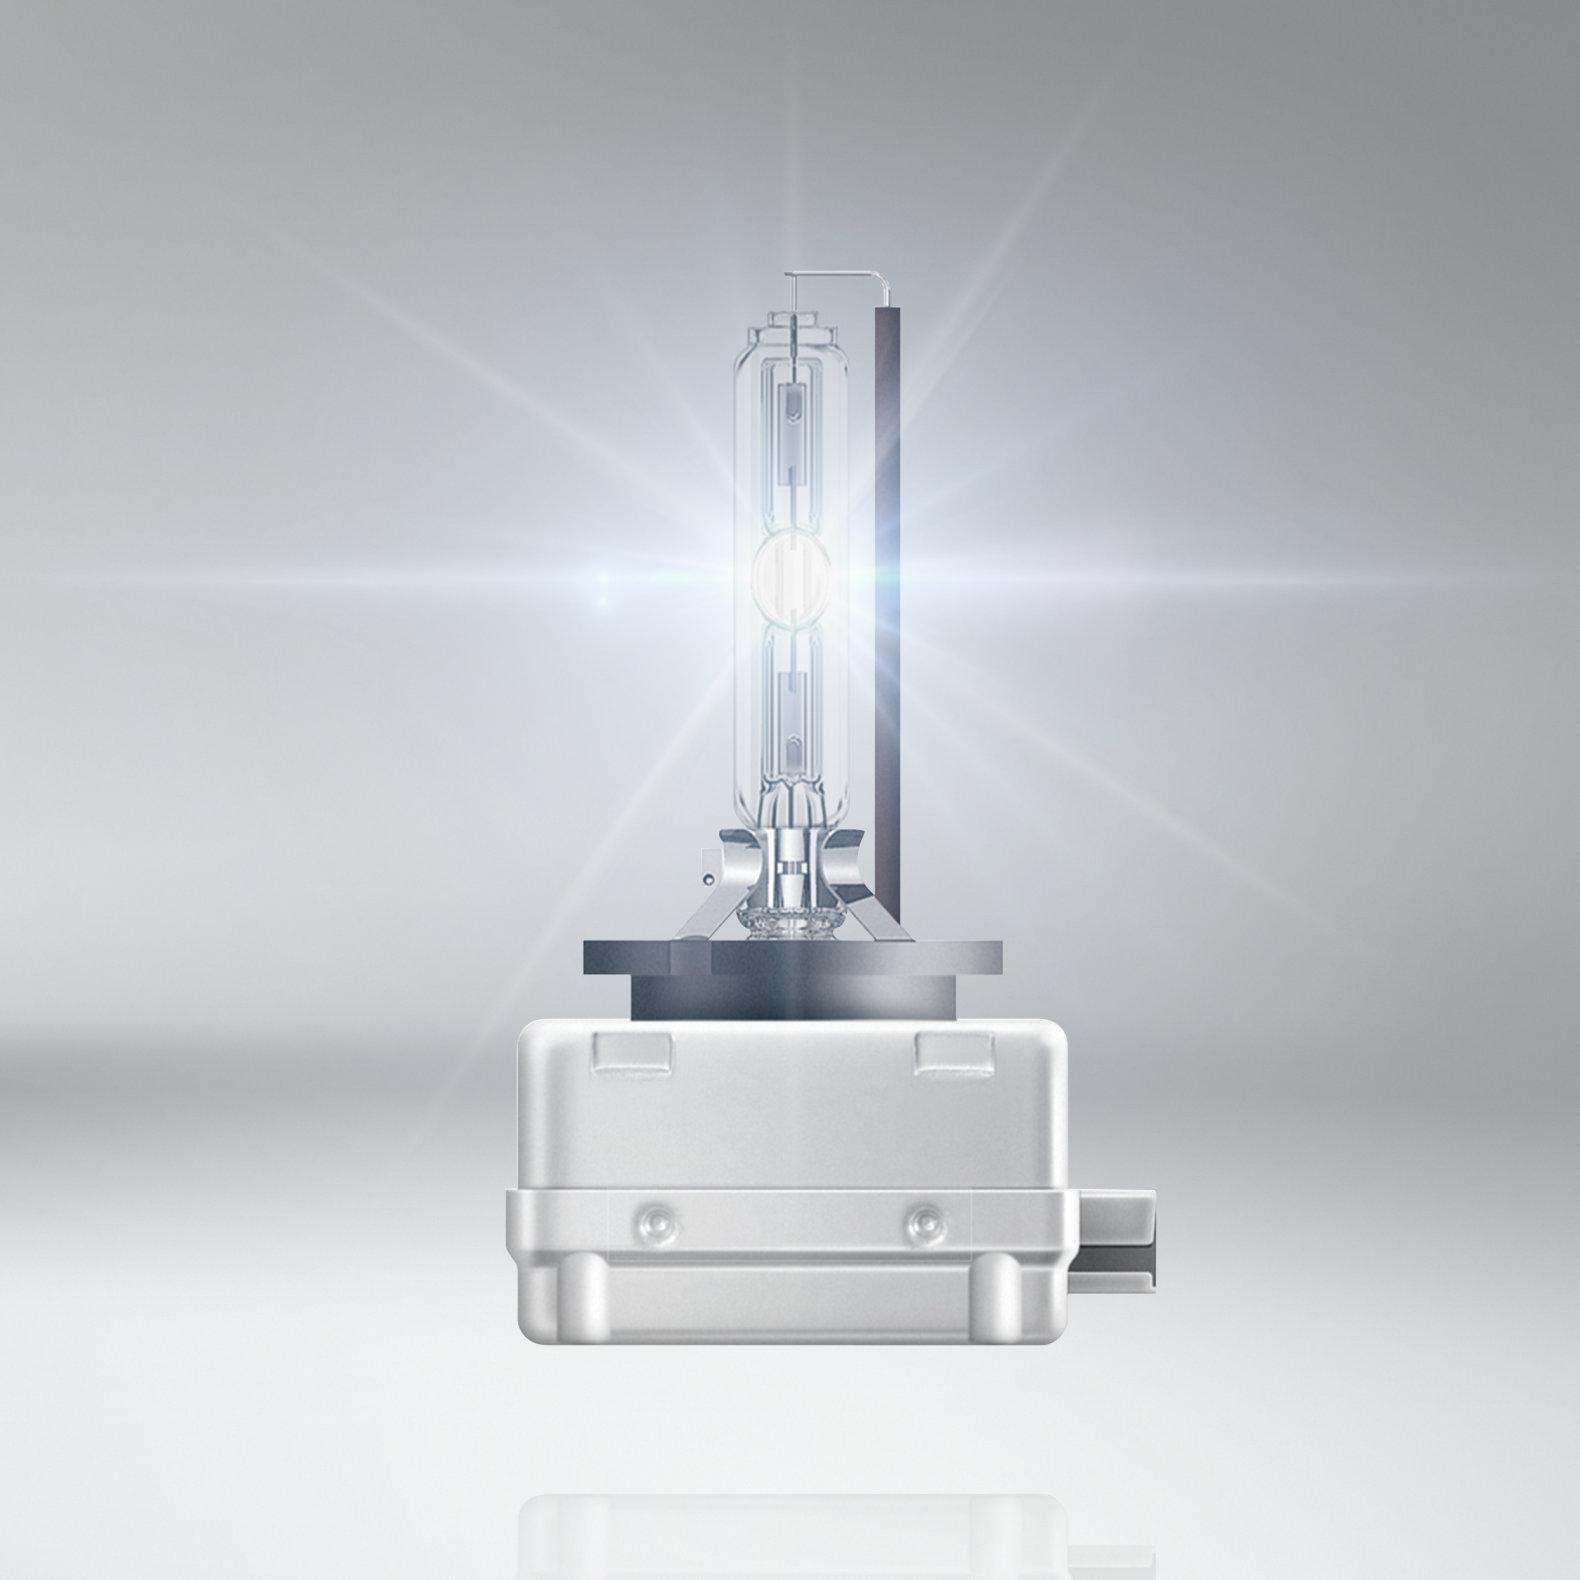 Ксеноновая лампа Osram 66140ult-hcb